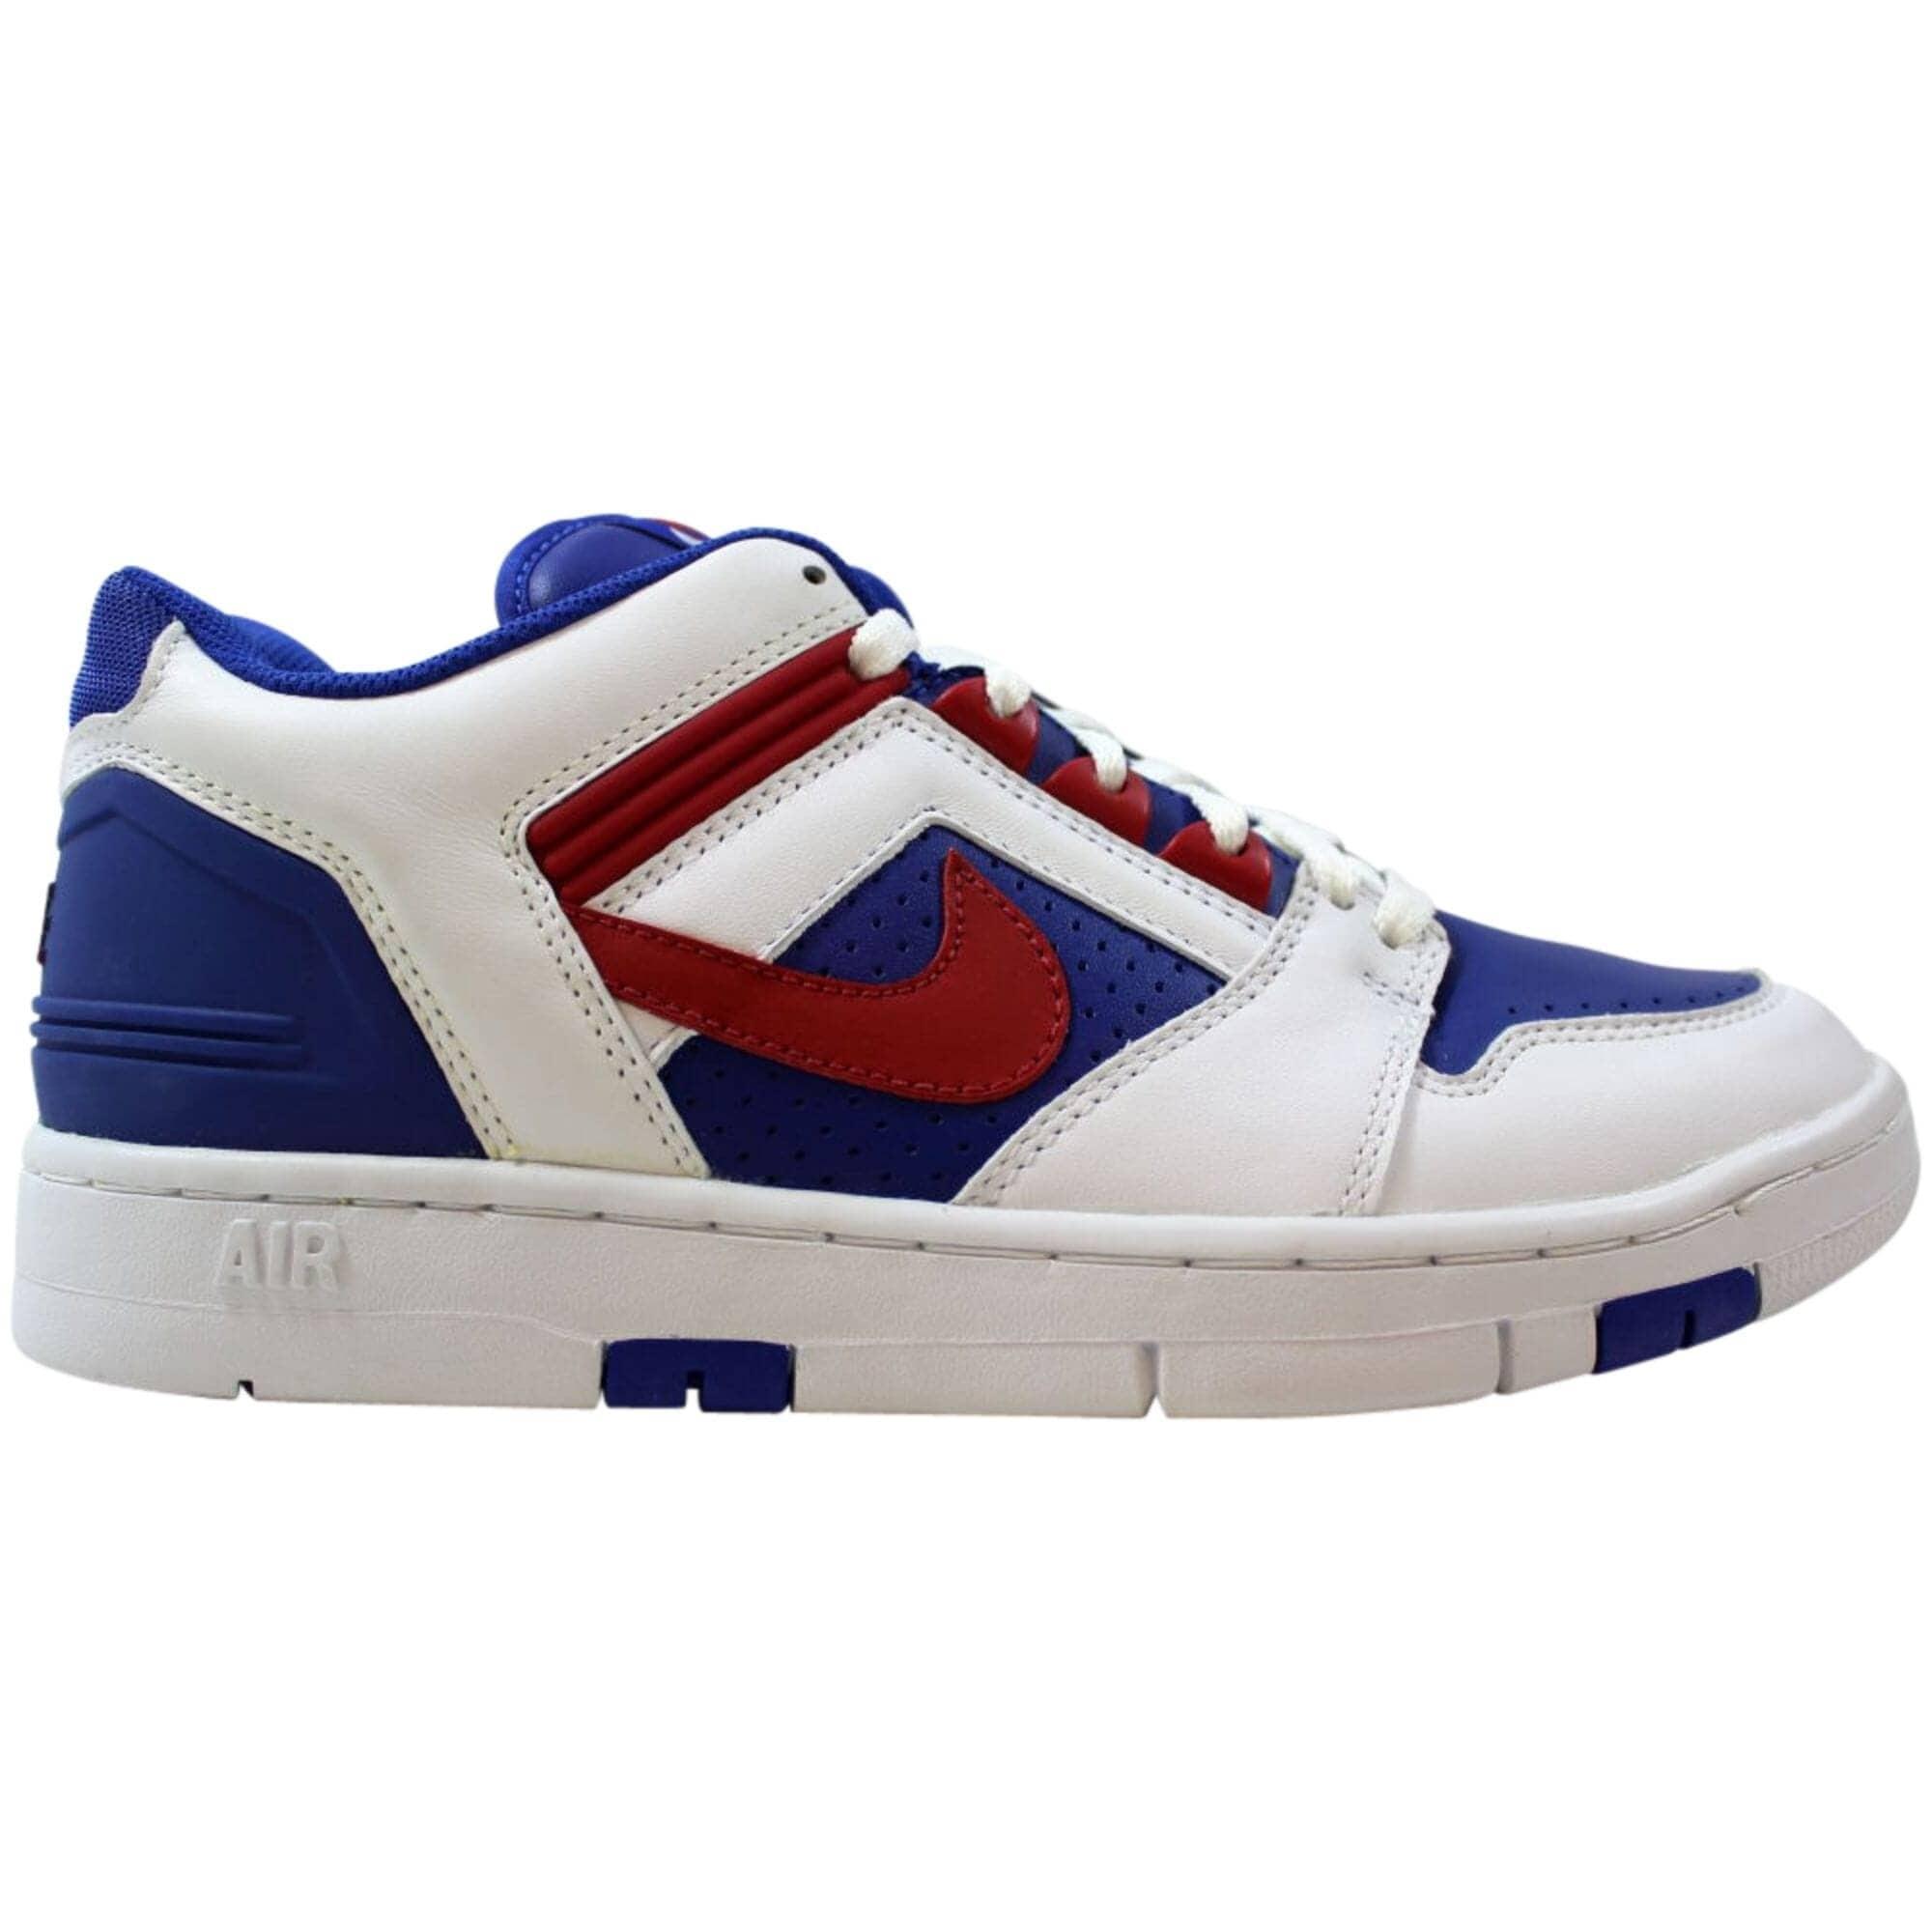 Nike Air Force II 2 Low